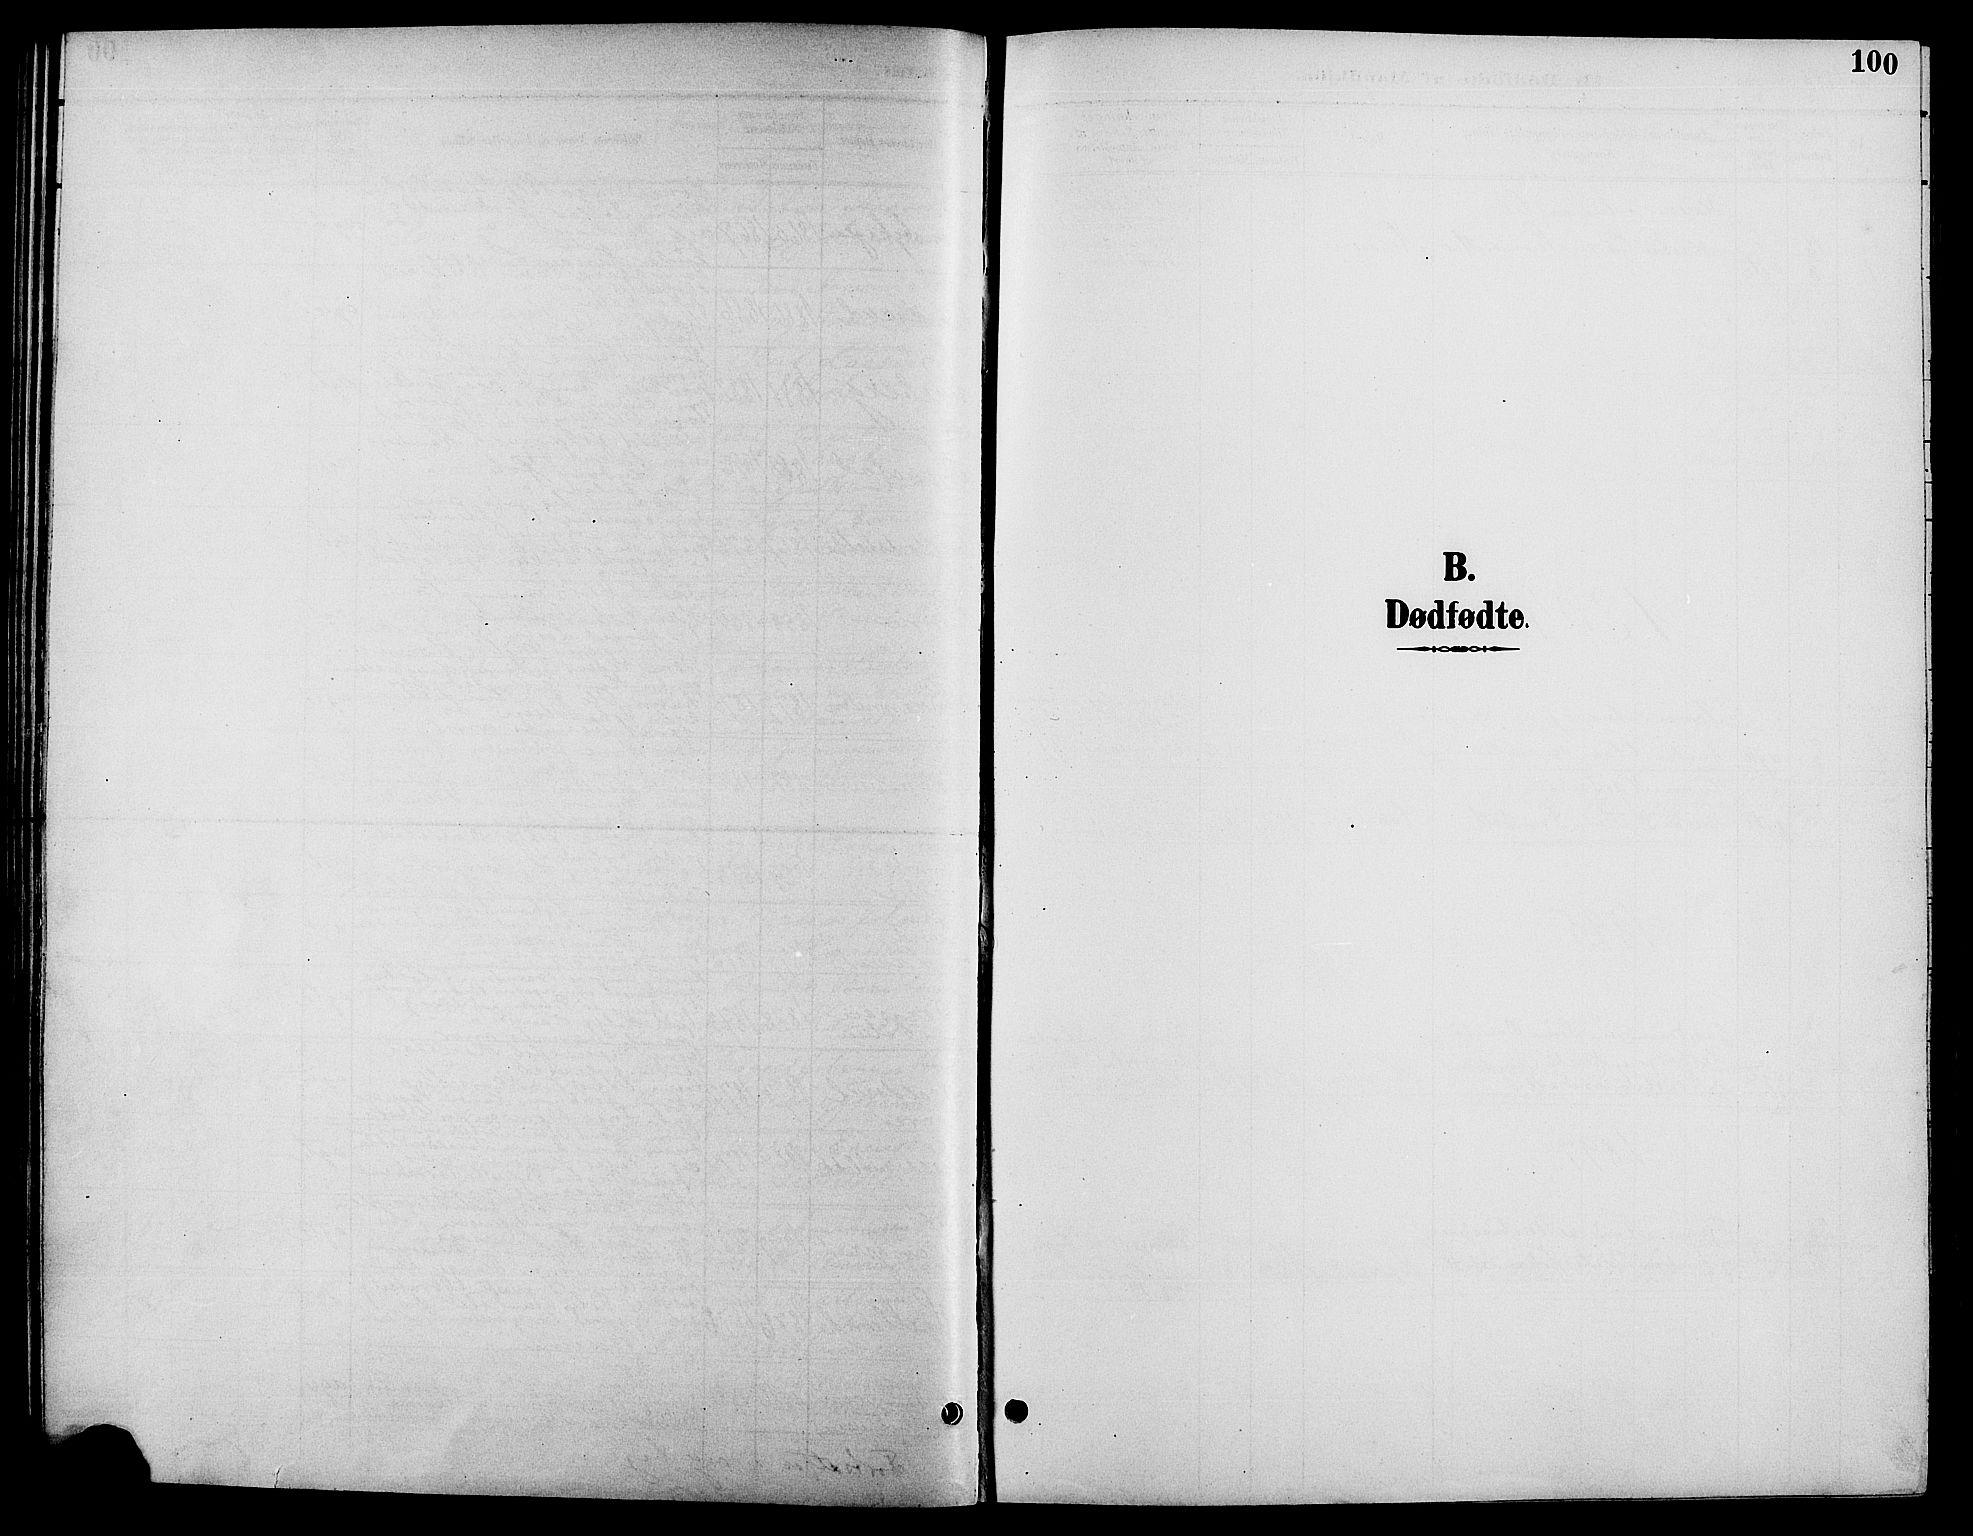 SAH, Biri prestekontor, Klokkerbok nr. 4, 1892-1909, s. 100